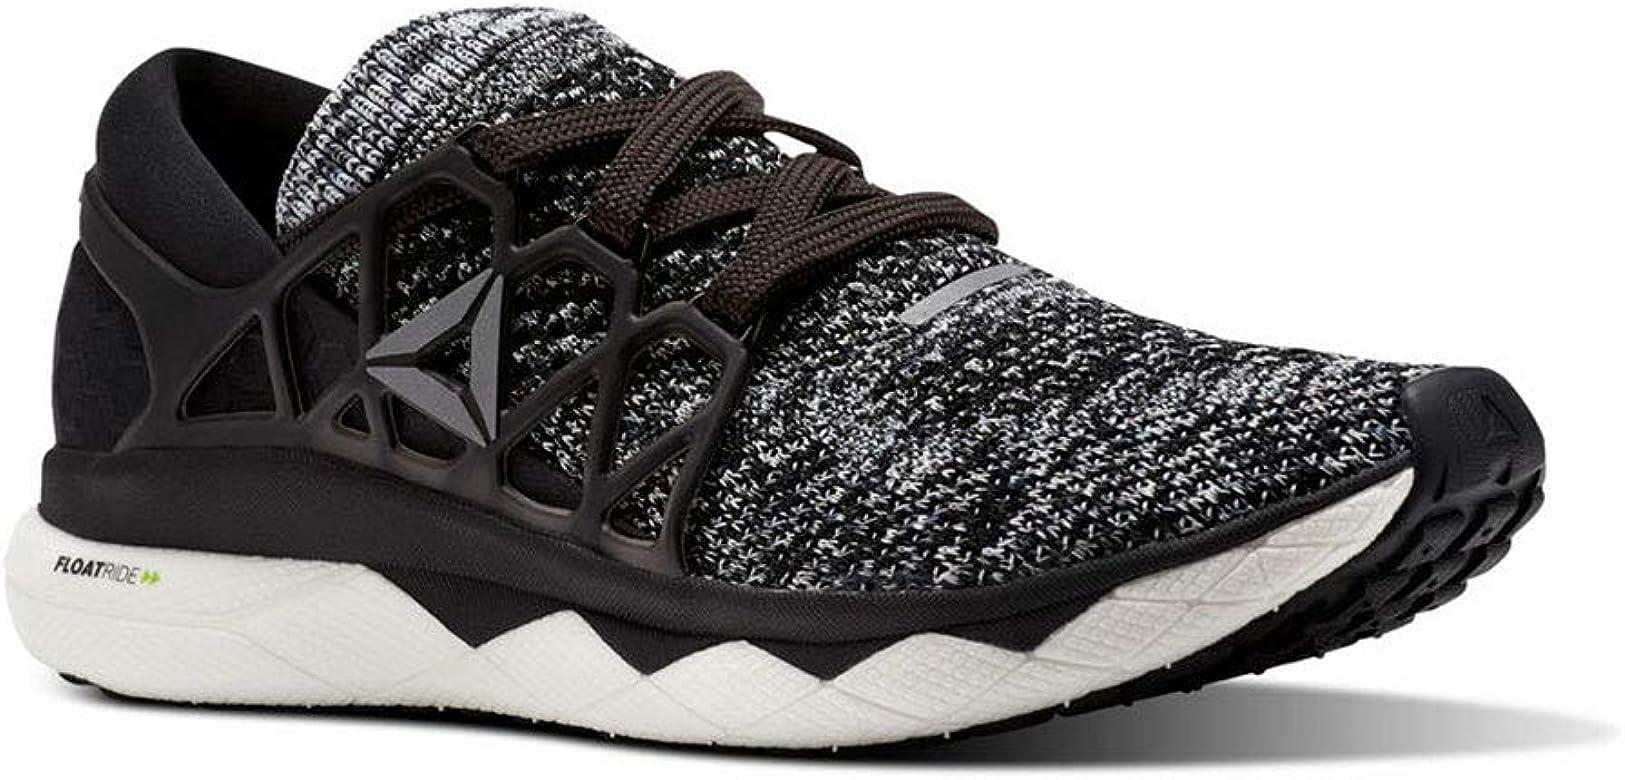 Reebok Men's Floatride Run Nite Running Shoe: Amazon.es